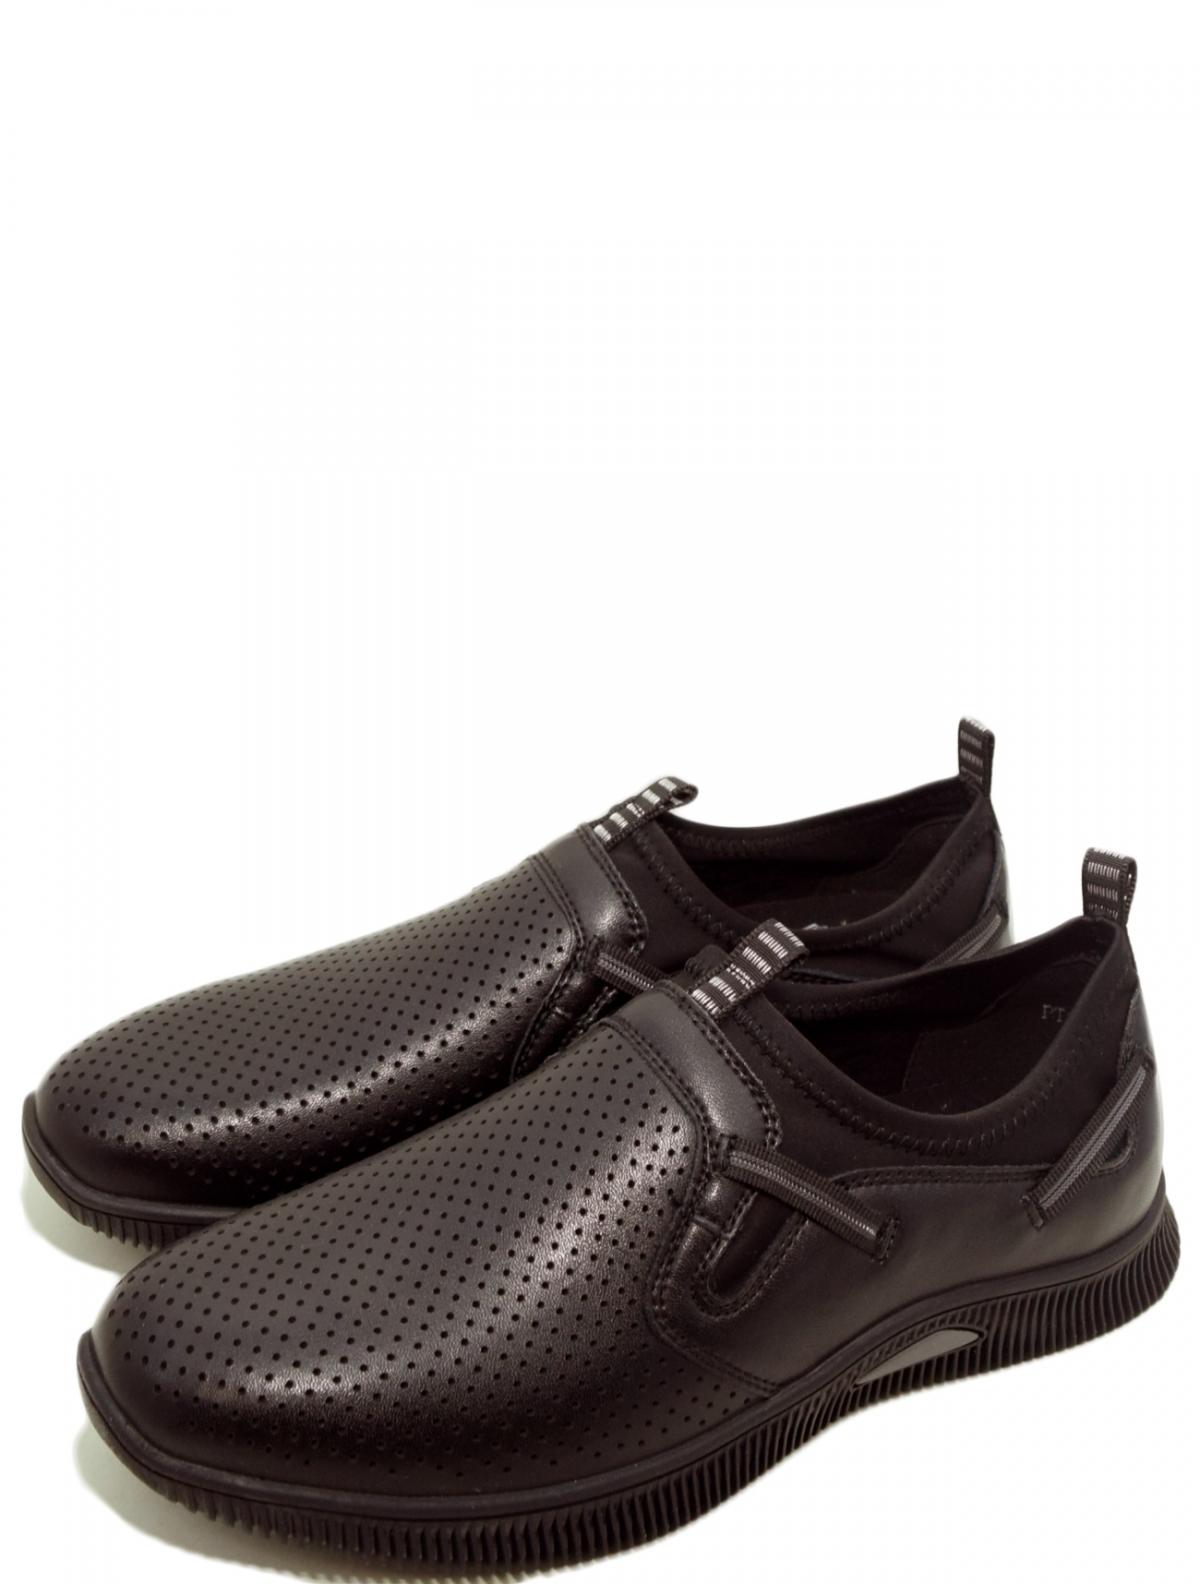 Carido PT3722-F26A туфли для мальчика